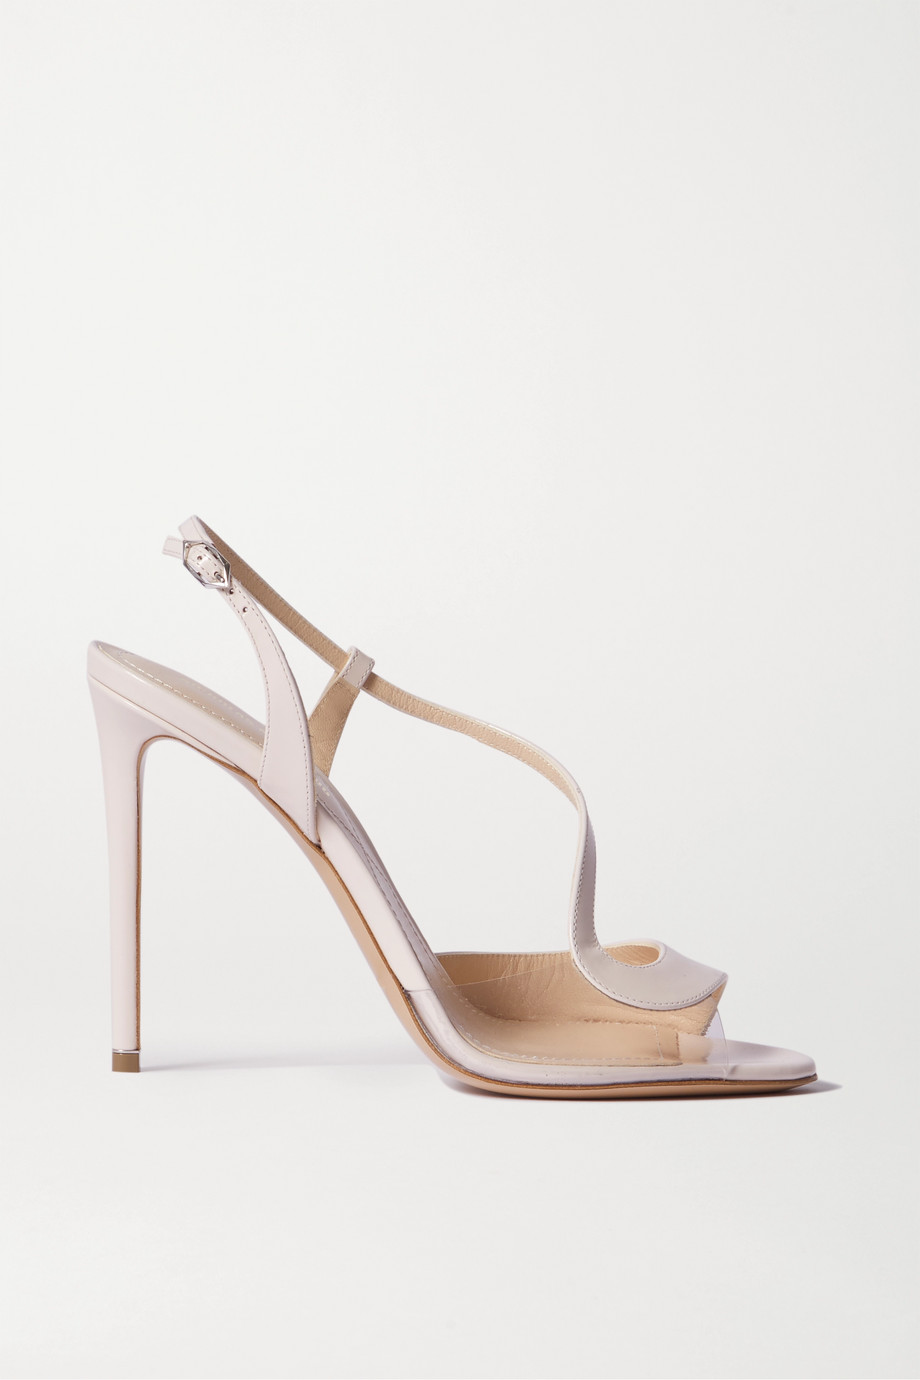 Nicholas Kirkwood S leather and PVC sandals